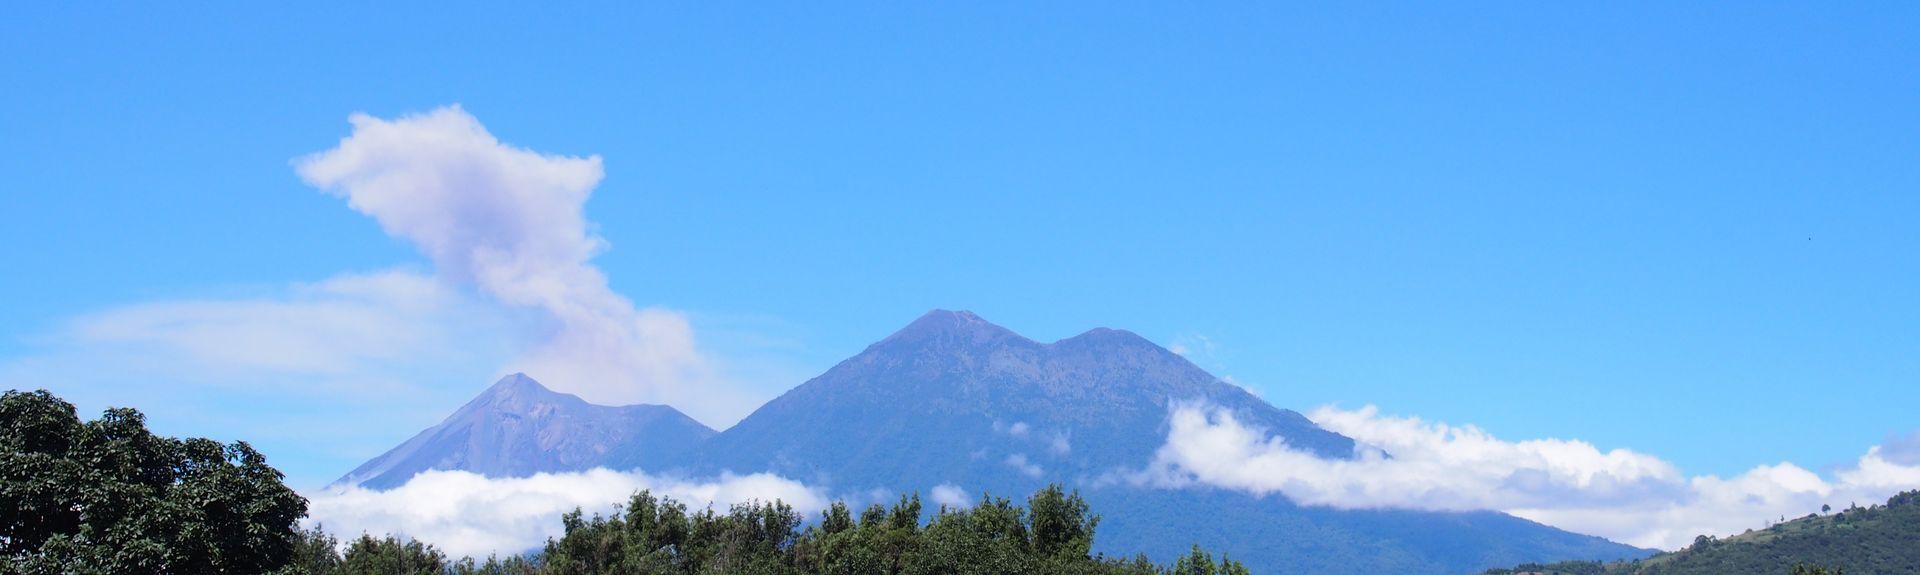 Villa Nueva, Guatemala (department), Guatemala